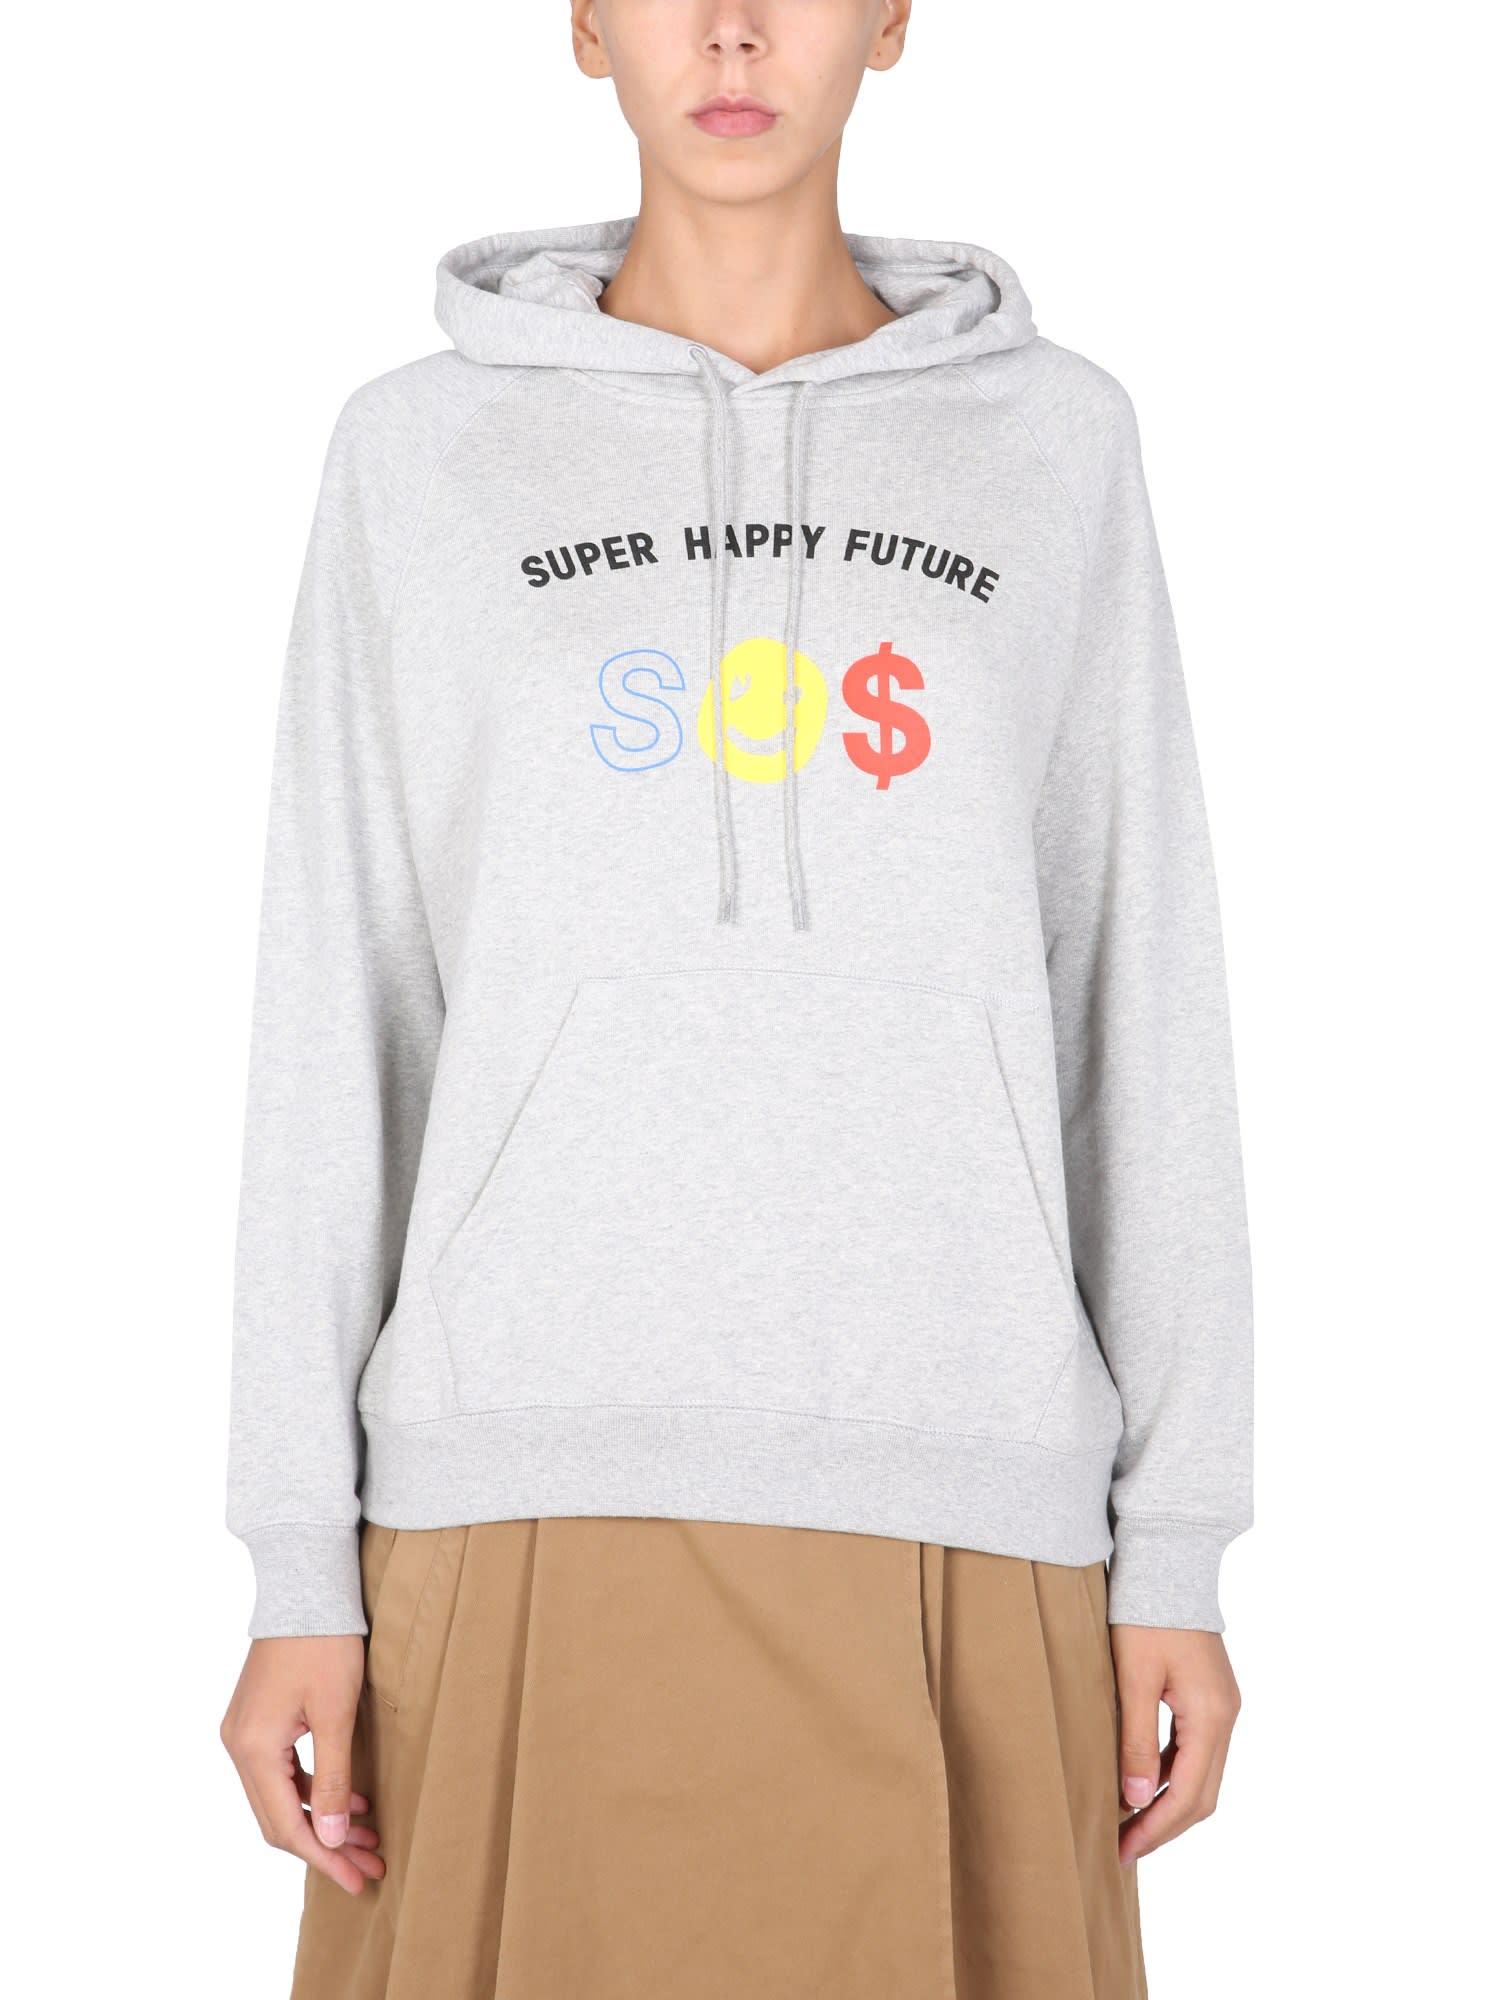 Super Happy Future Sweatshirt